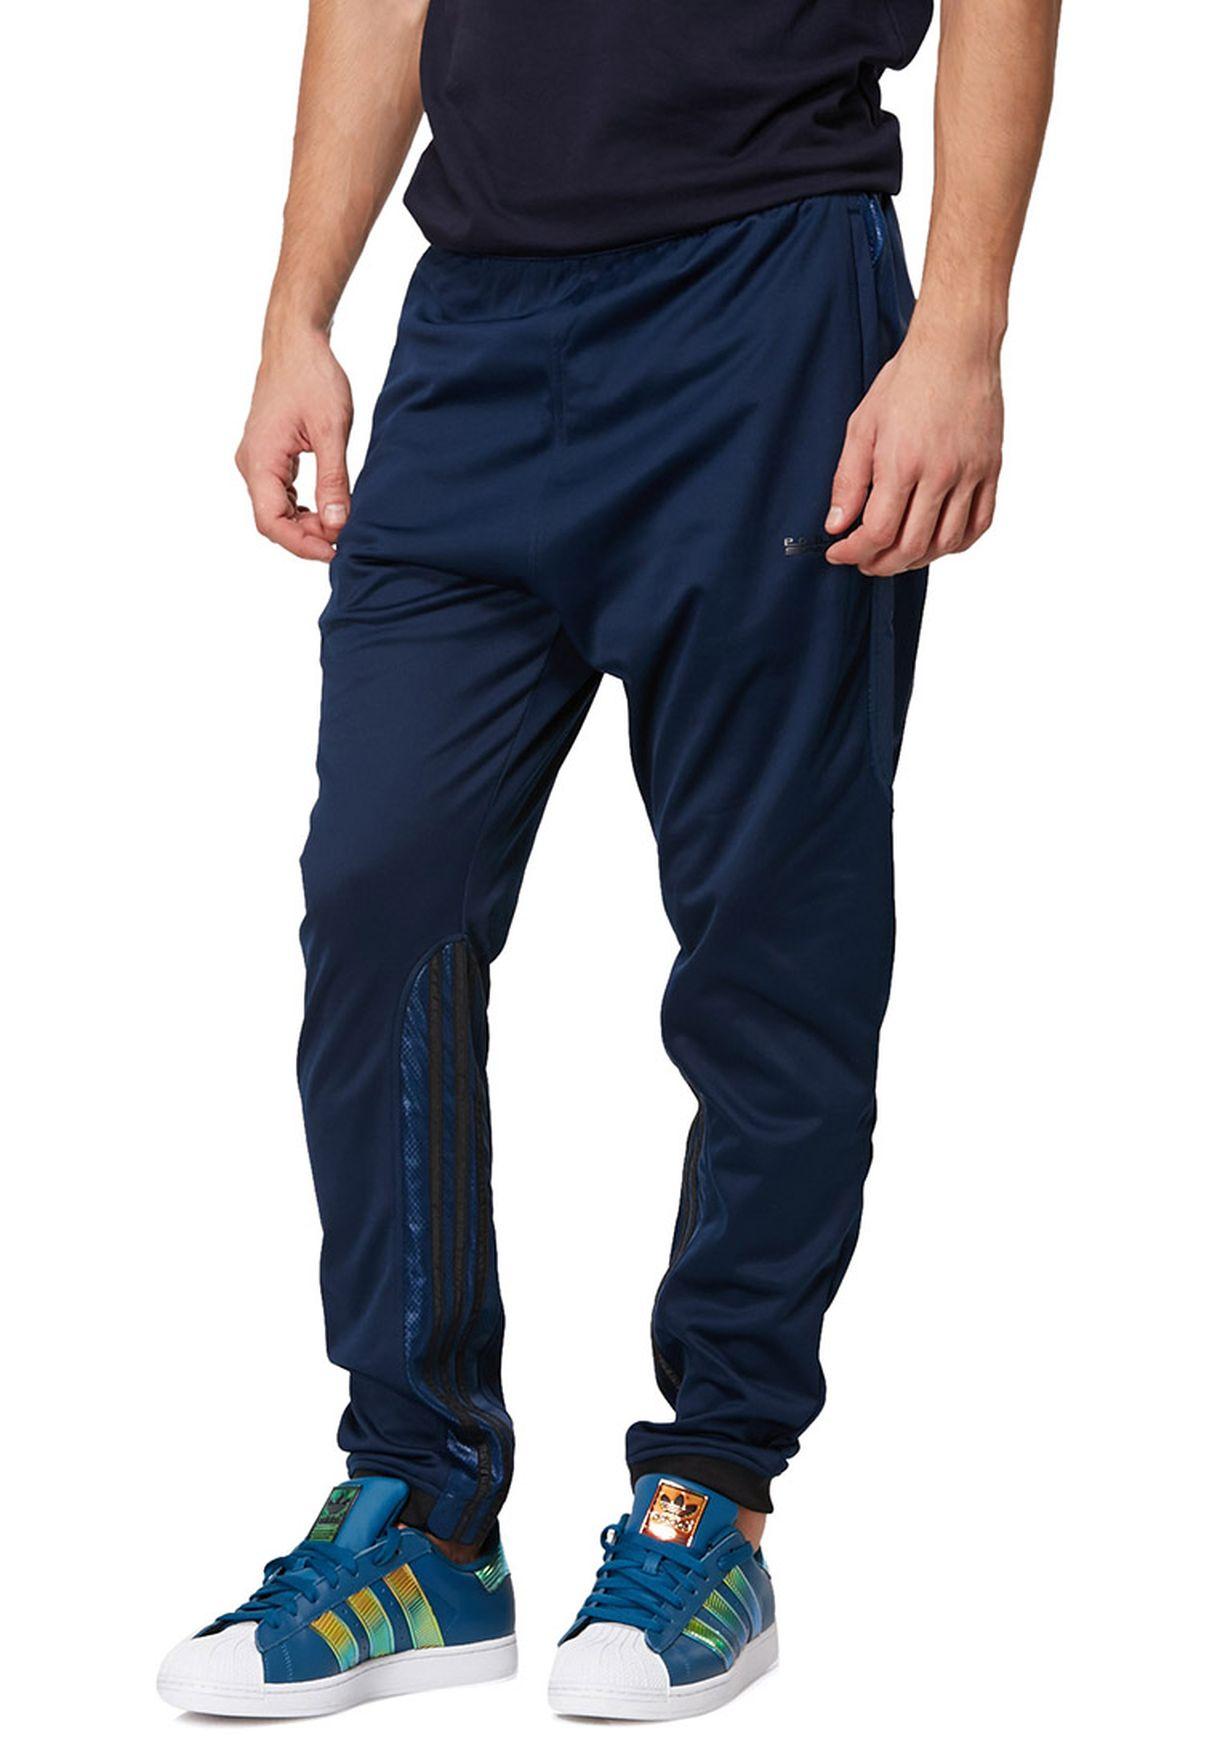 e4554ec1 Shop adidas Originals black Track Pants M64791 for Men in UAE ...